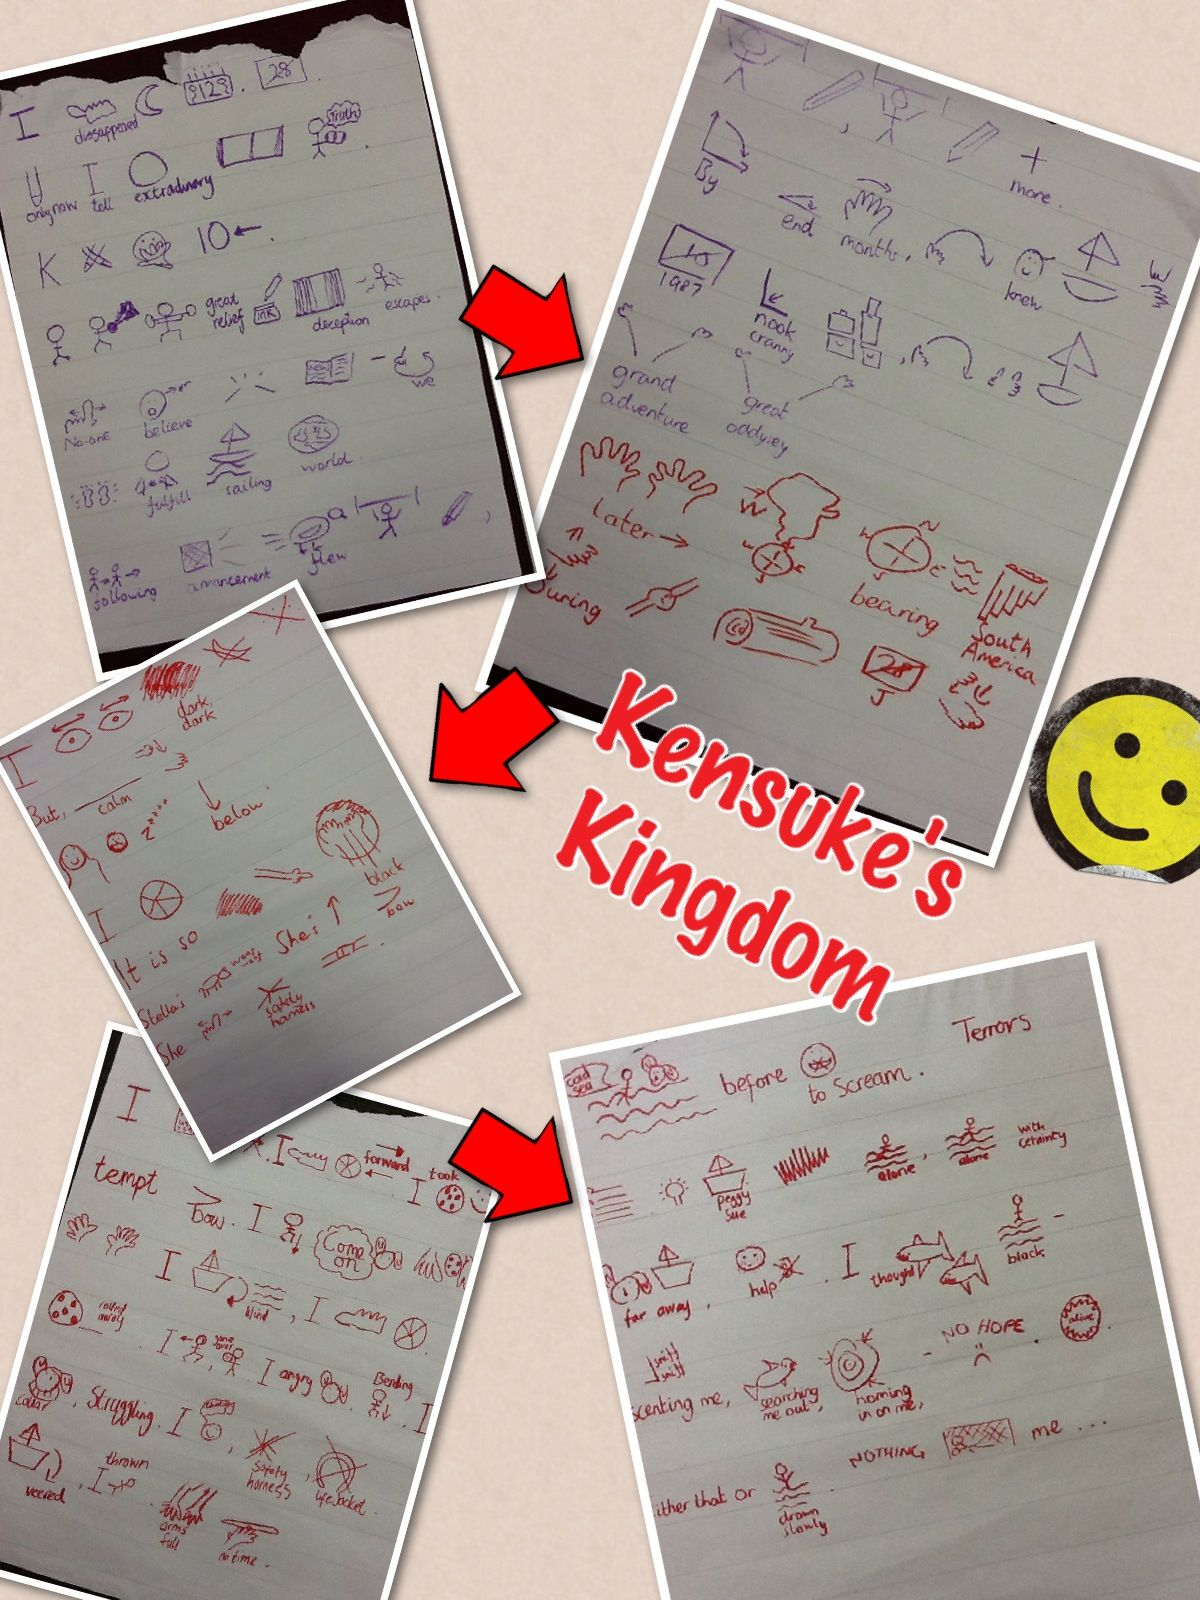 Kensuke's Kingdom Story Map